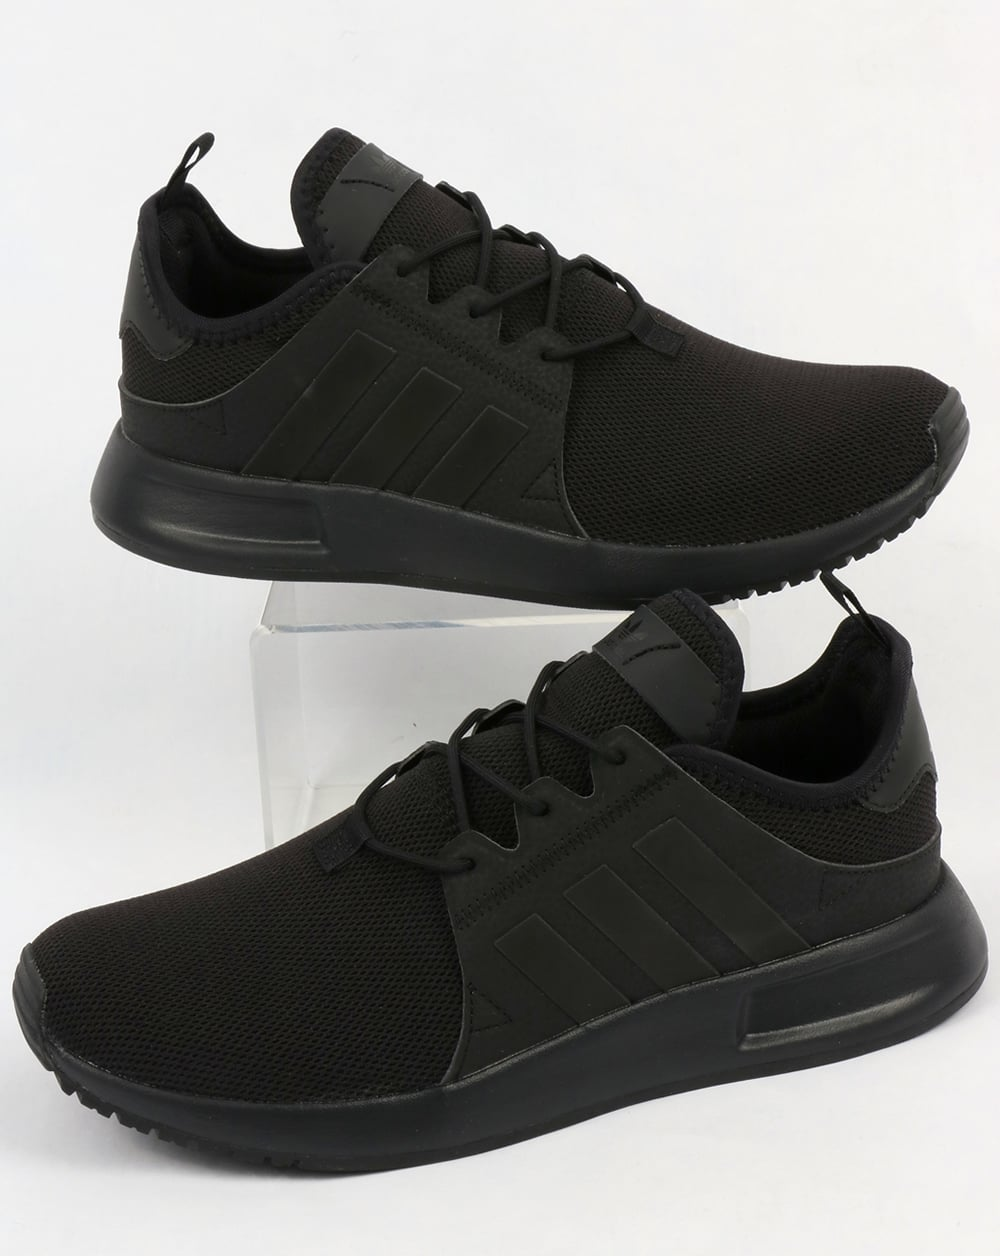 Adidas XPLR Trainers Black/Trace Grey